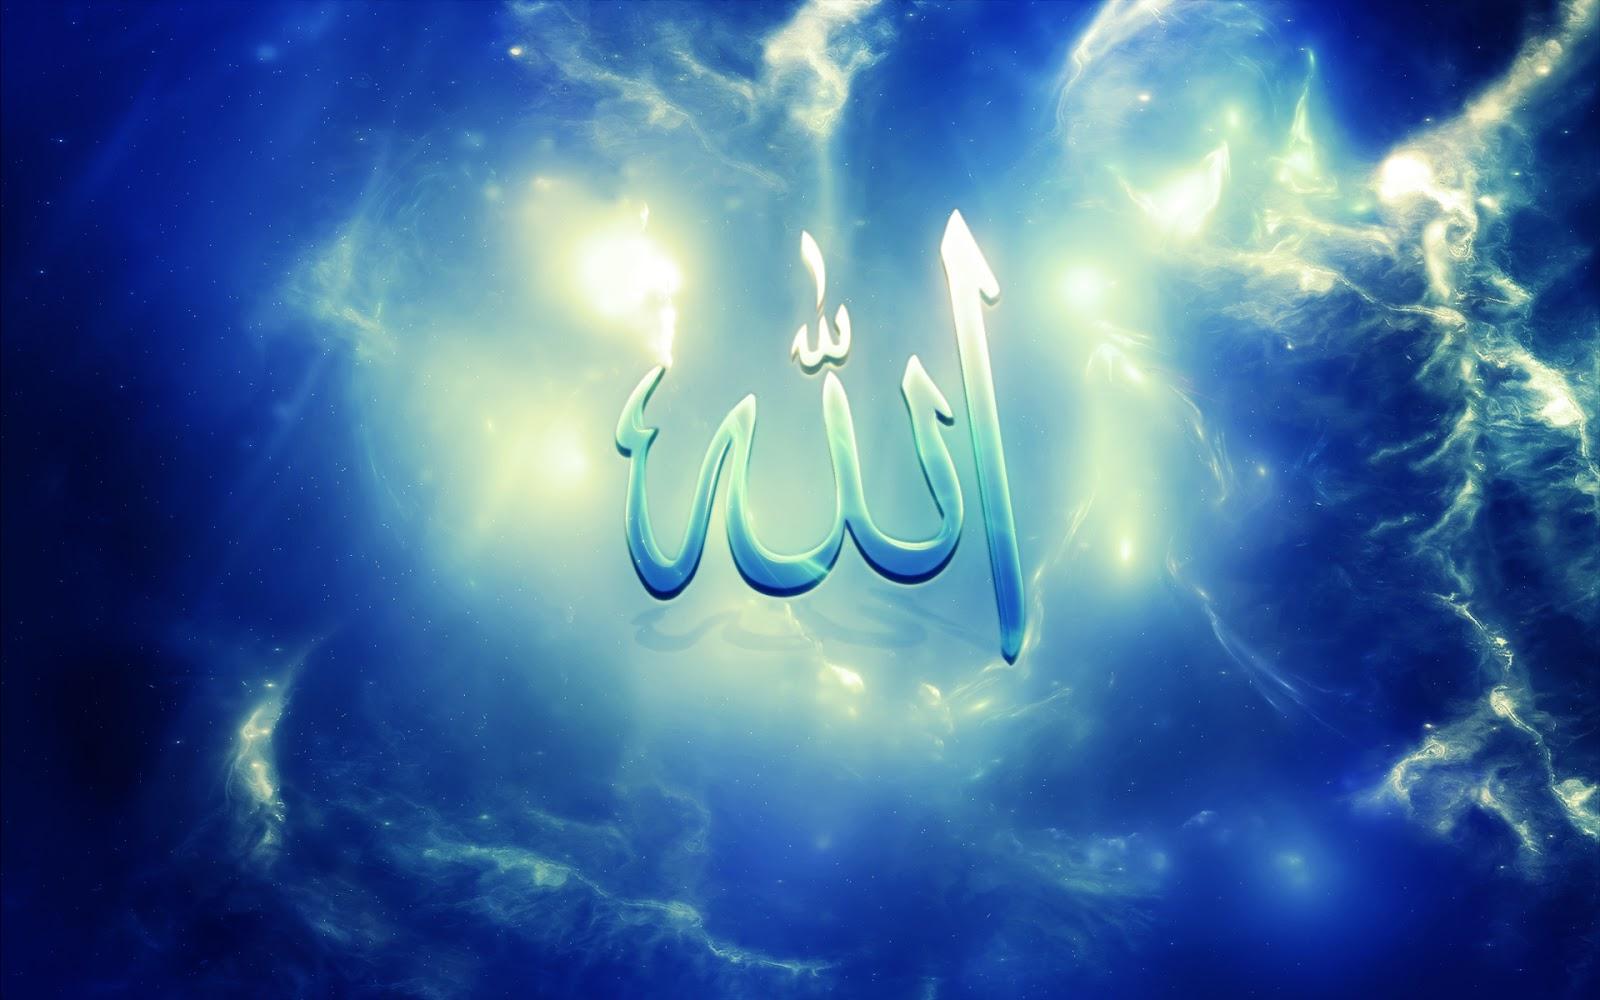 Allah Name wallpapers HD | Islamic Wallpapers